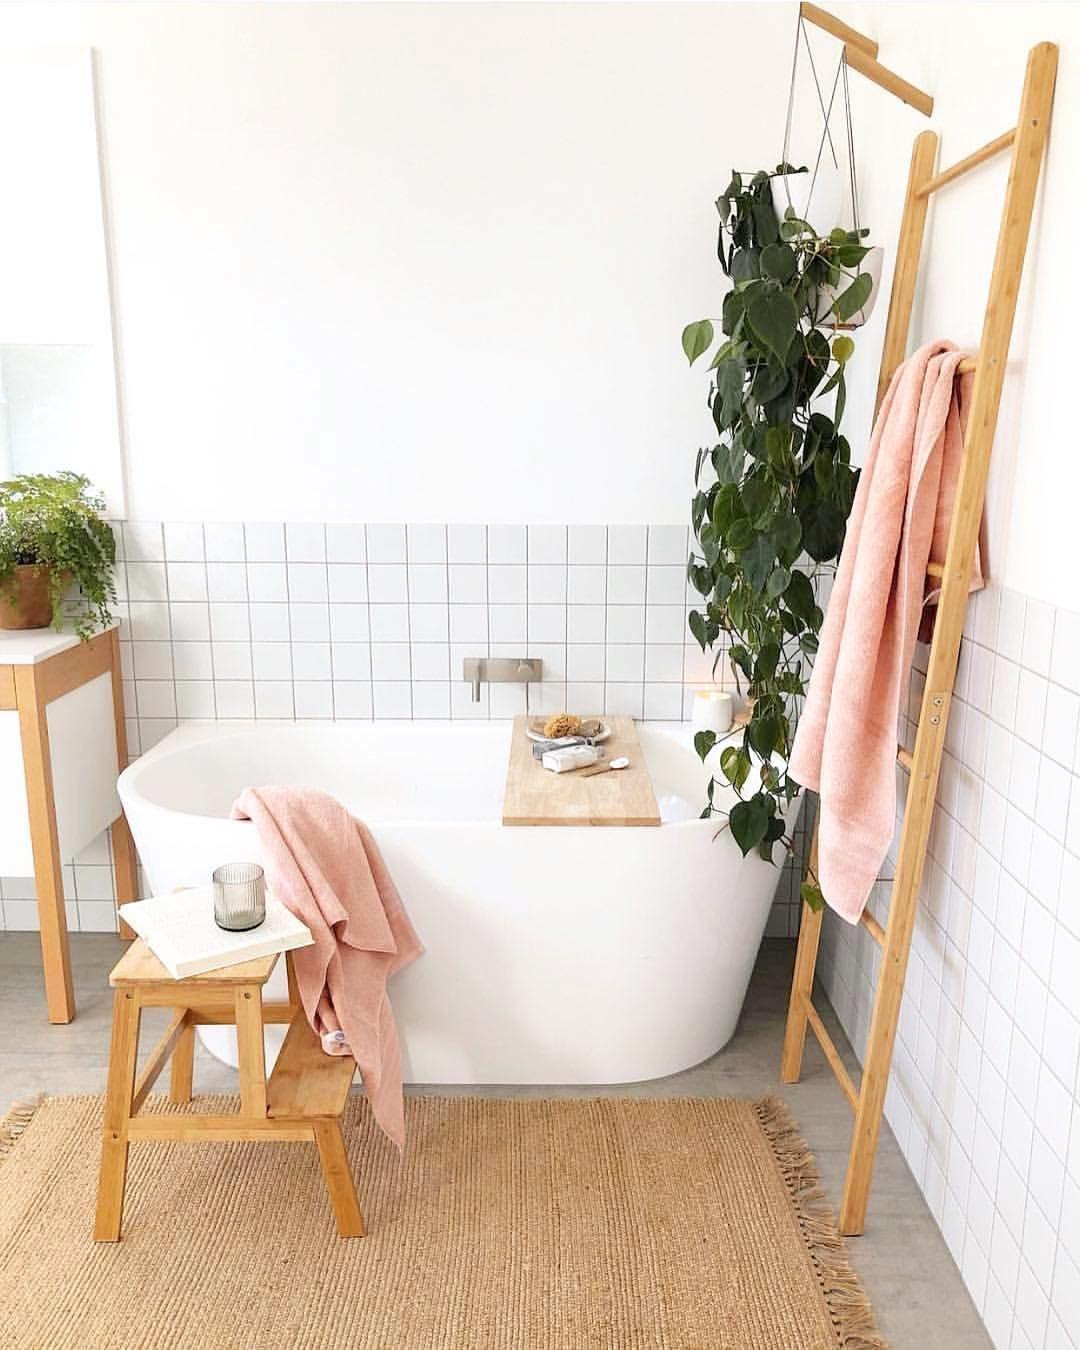 bright and light bathroom white bathtub wood ladder rack vivid vines white ceramic tile walls flat woven runner with fringed tassels wood stool